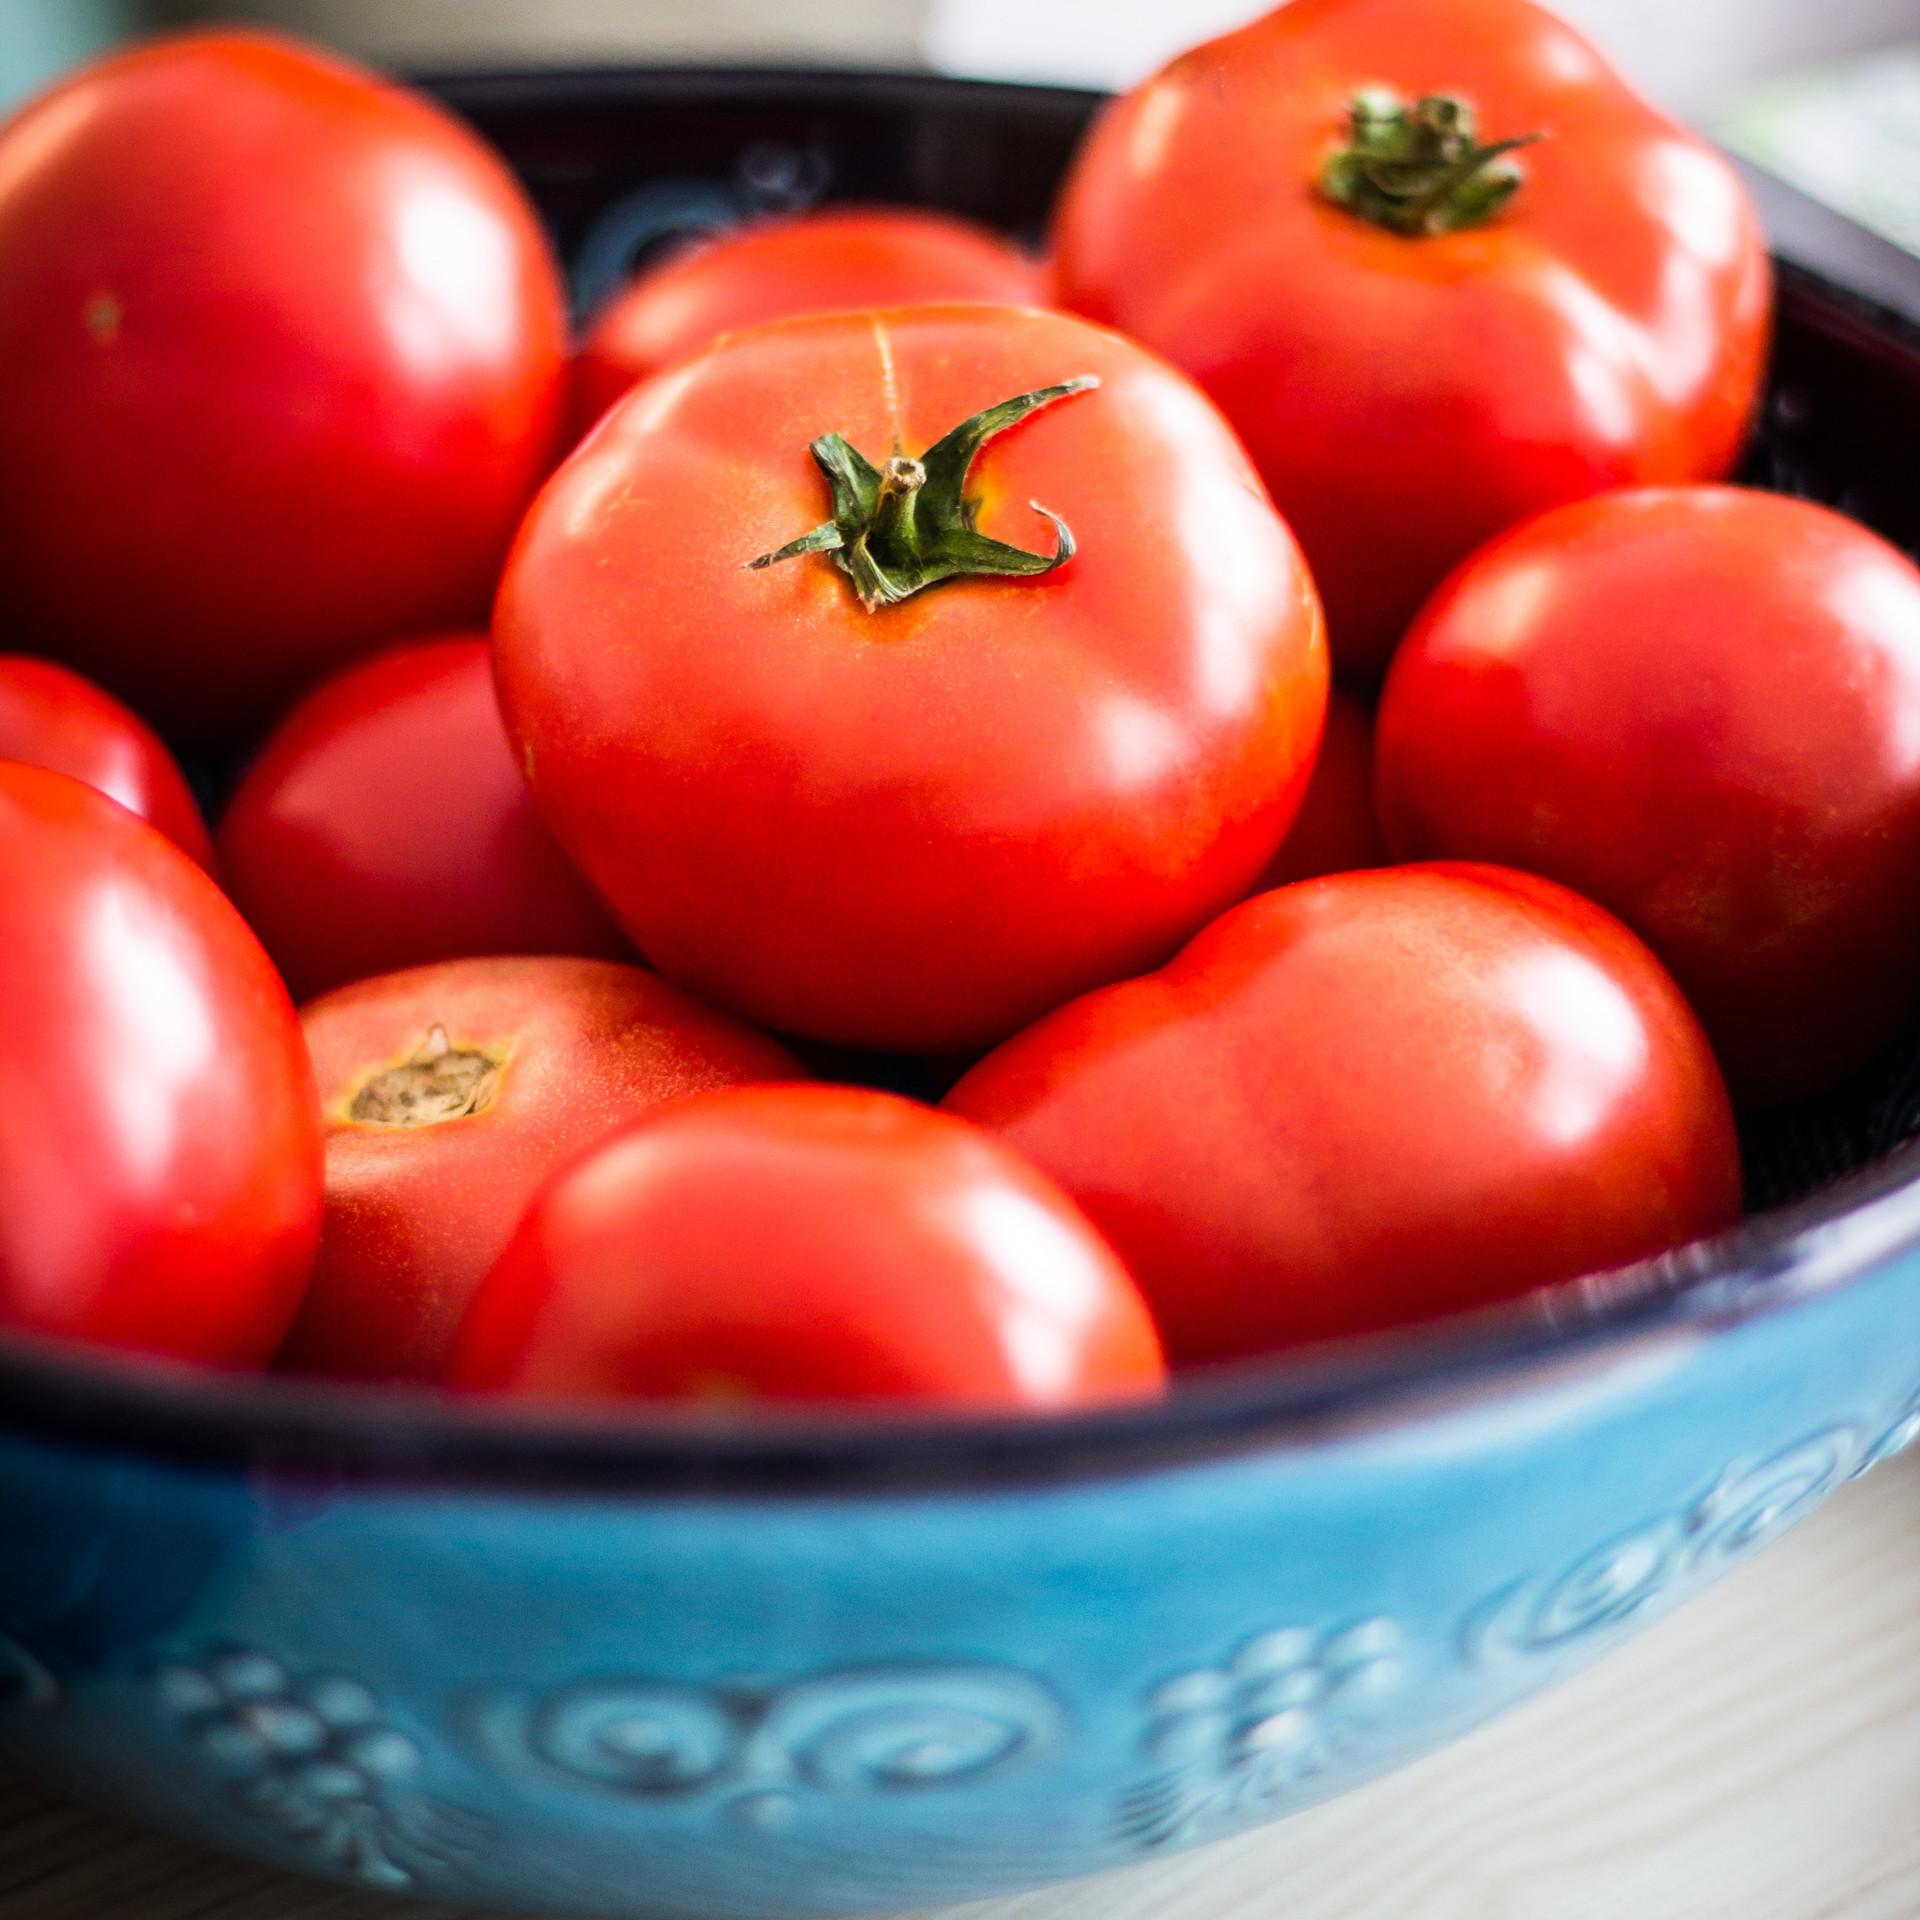 Colorado Wholesale Tomato Seeds